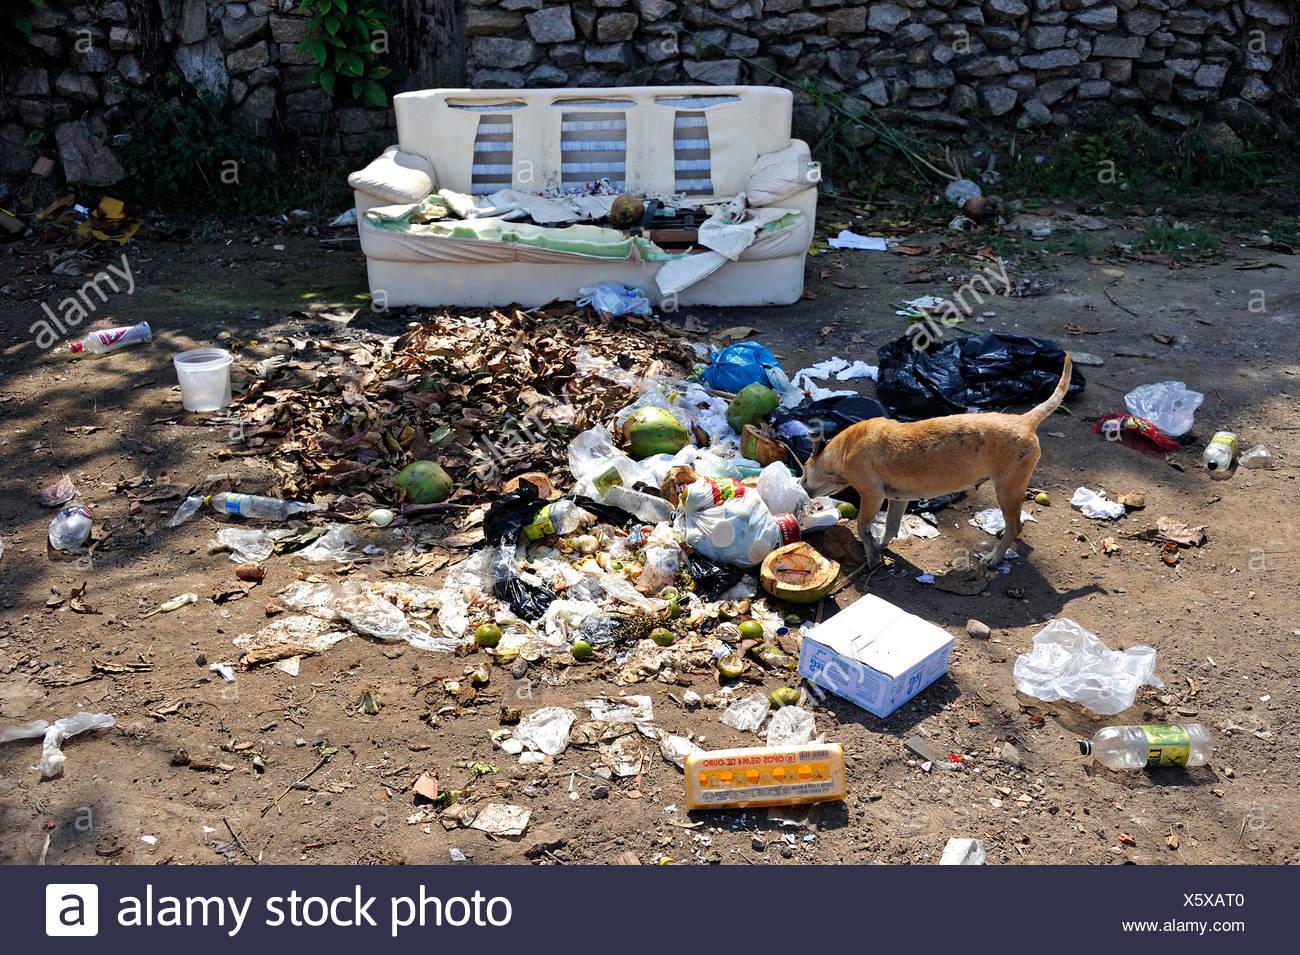 Dog rummaging through rubbish bags on a waste heap next to an old sofa, Rio de Janeiro, Brazil, South America, Latin America - Stock Image